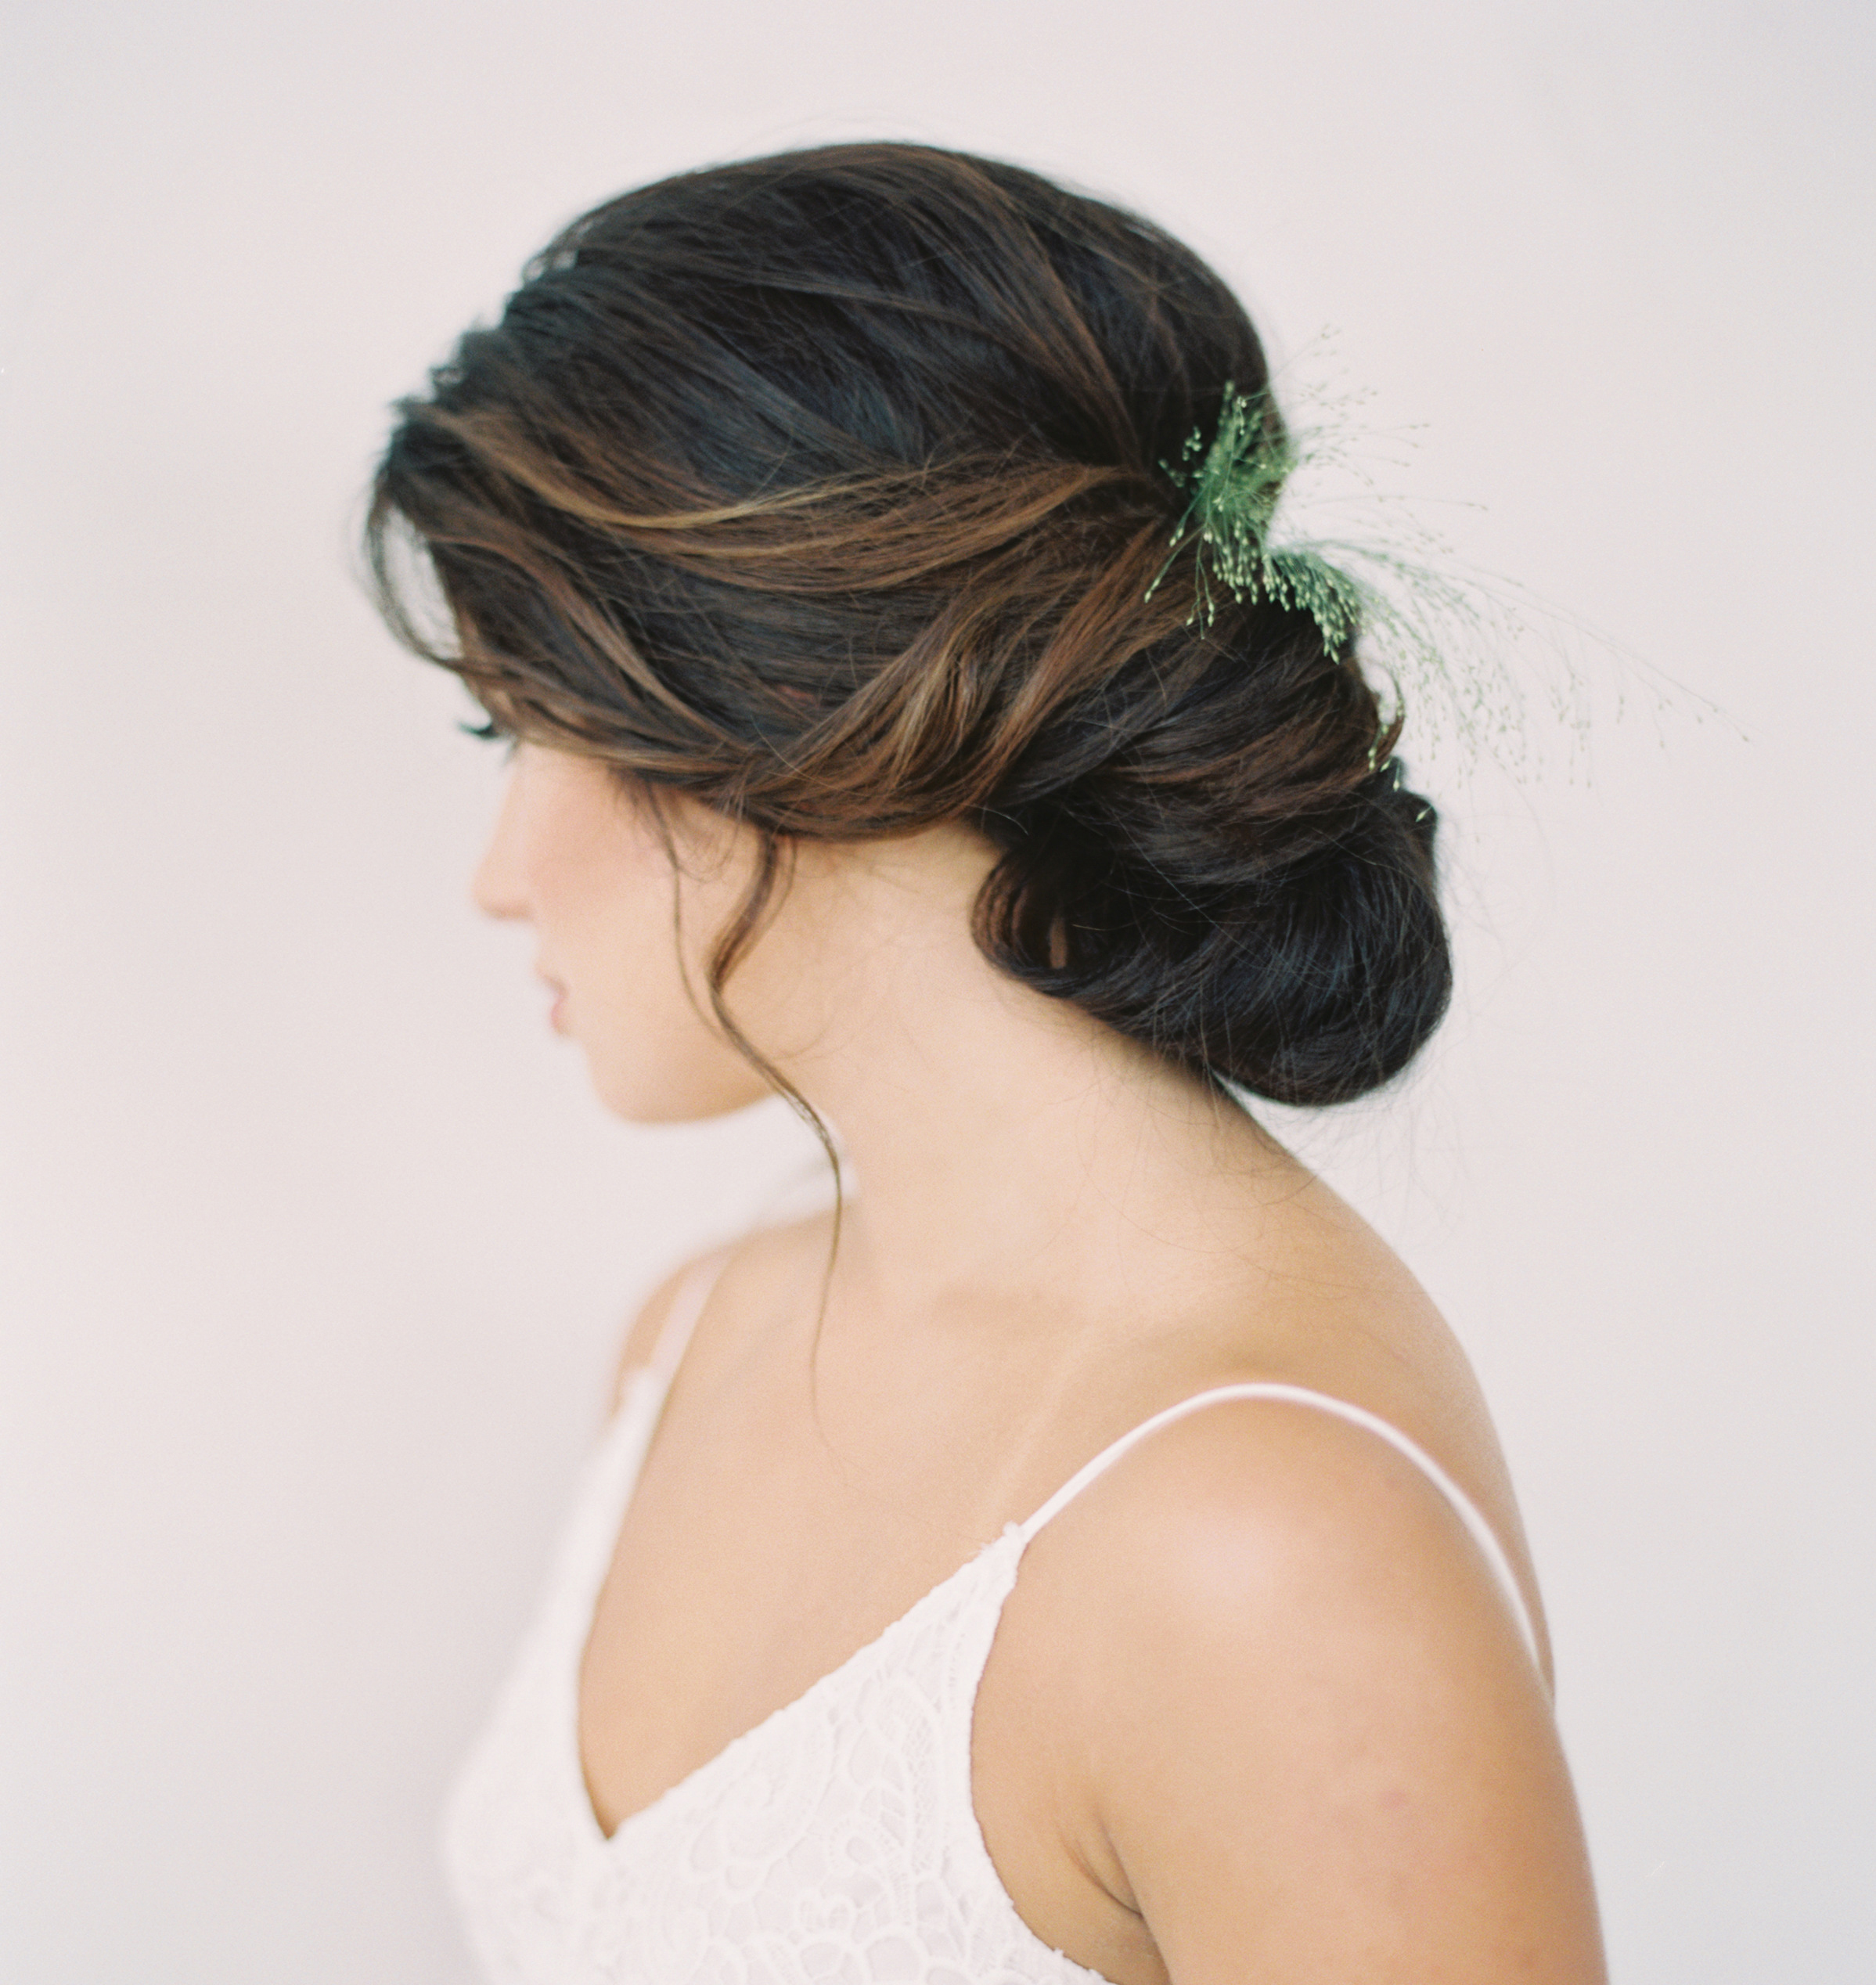 -HAIR -